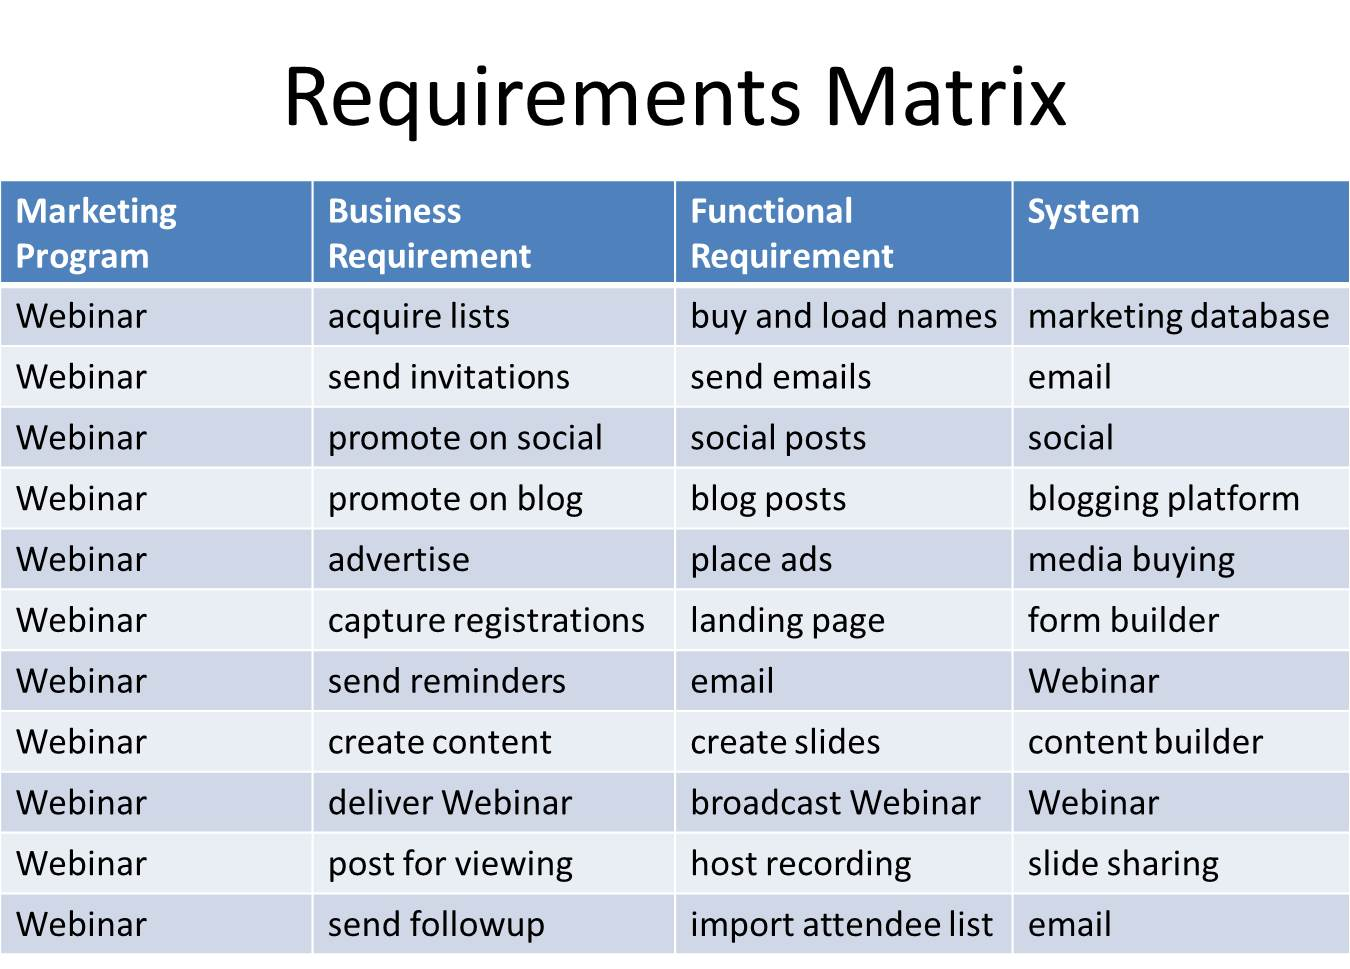 Customer Experience Matrix Design Your Best Marketing